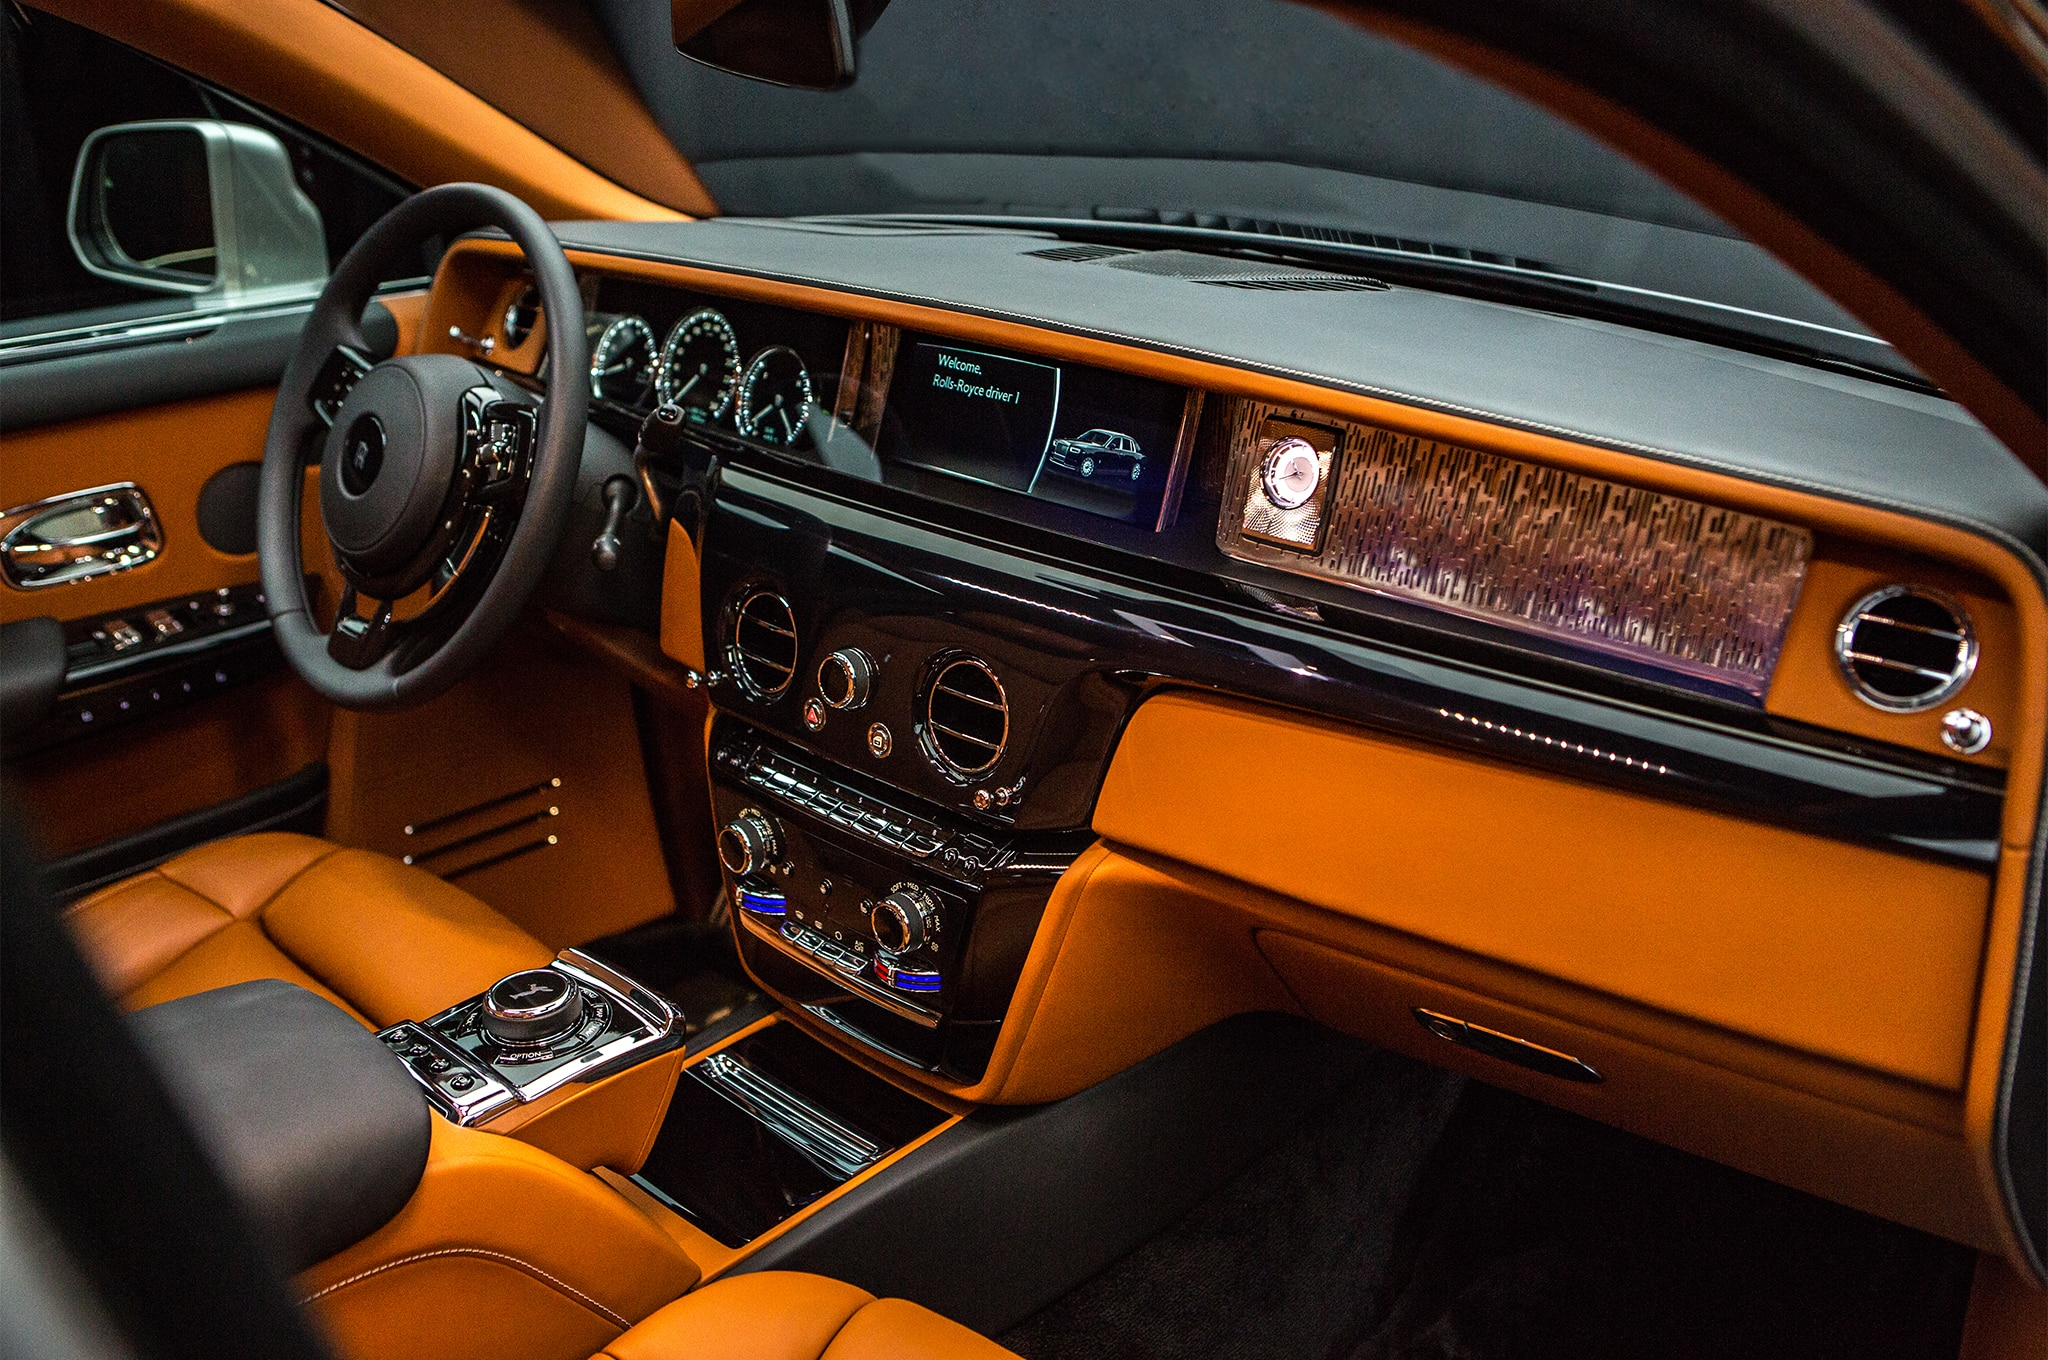 2018 Rolls Royce Phantom interior - Motor Trend en Español